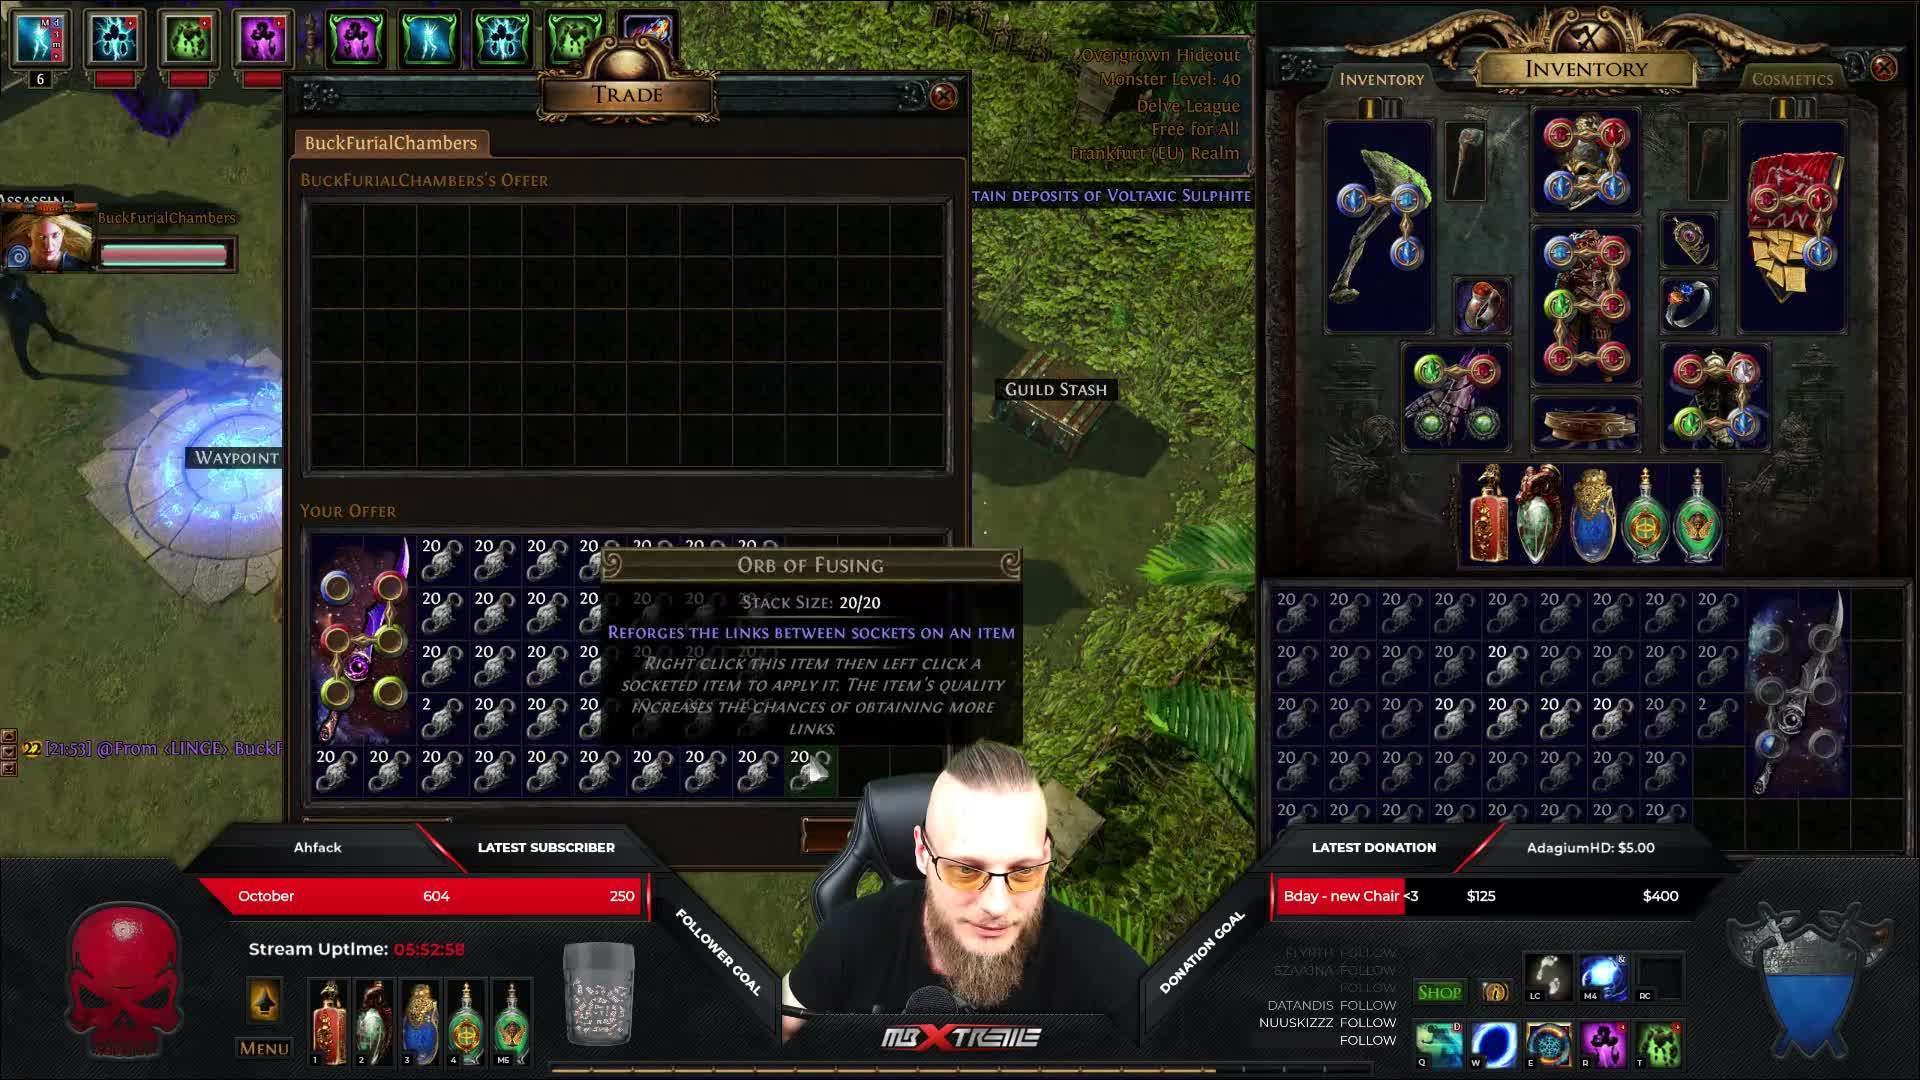 mbXtreme - Dafi! God of Links! - Twitch